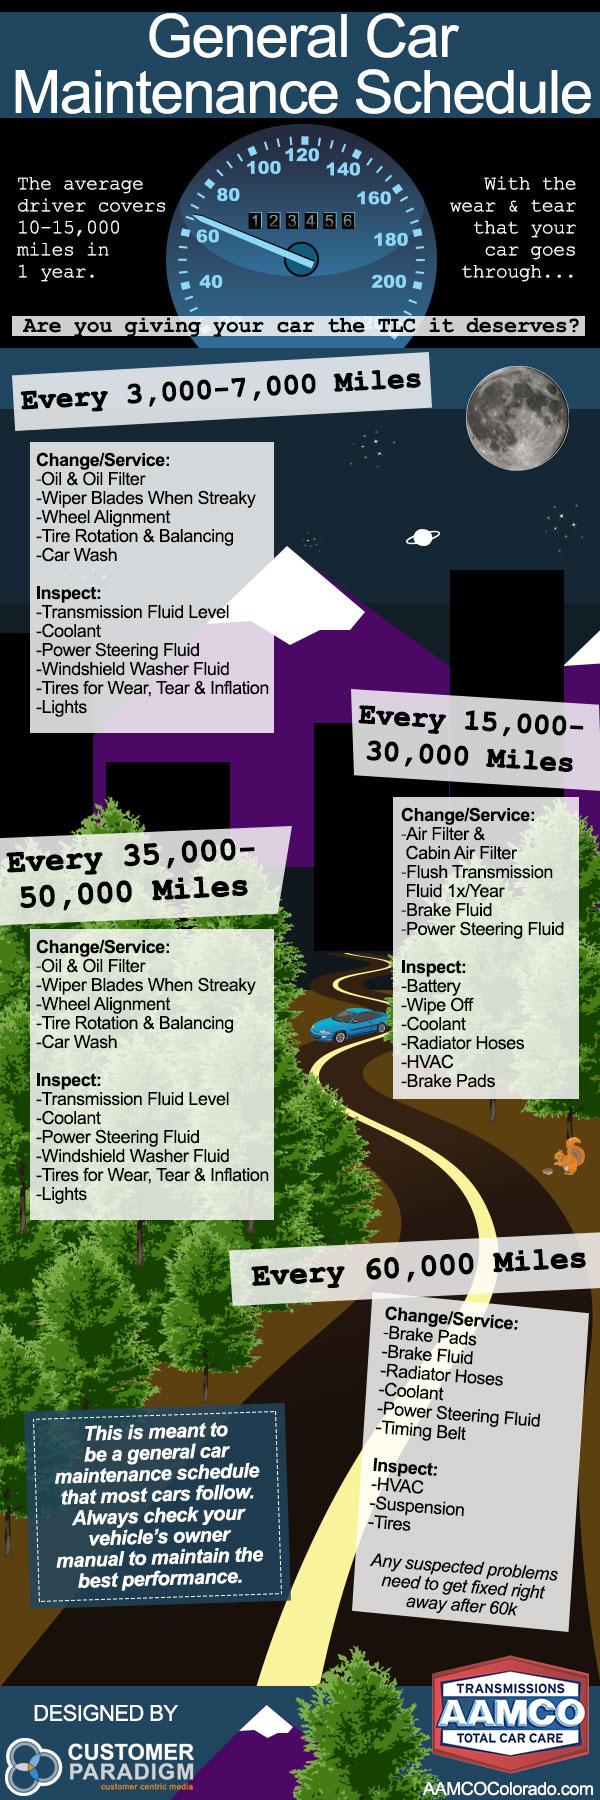 General car maintenance schedule infographic